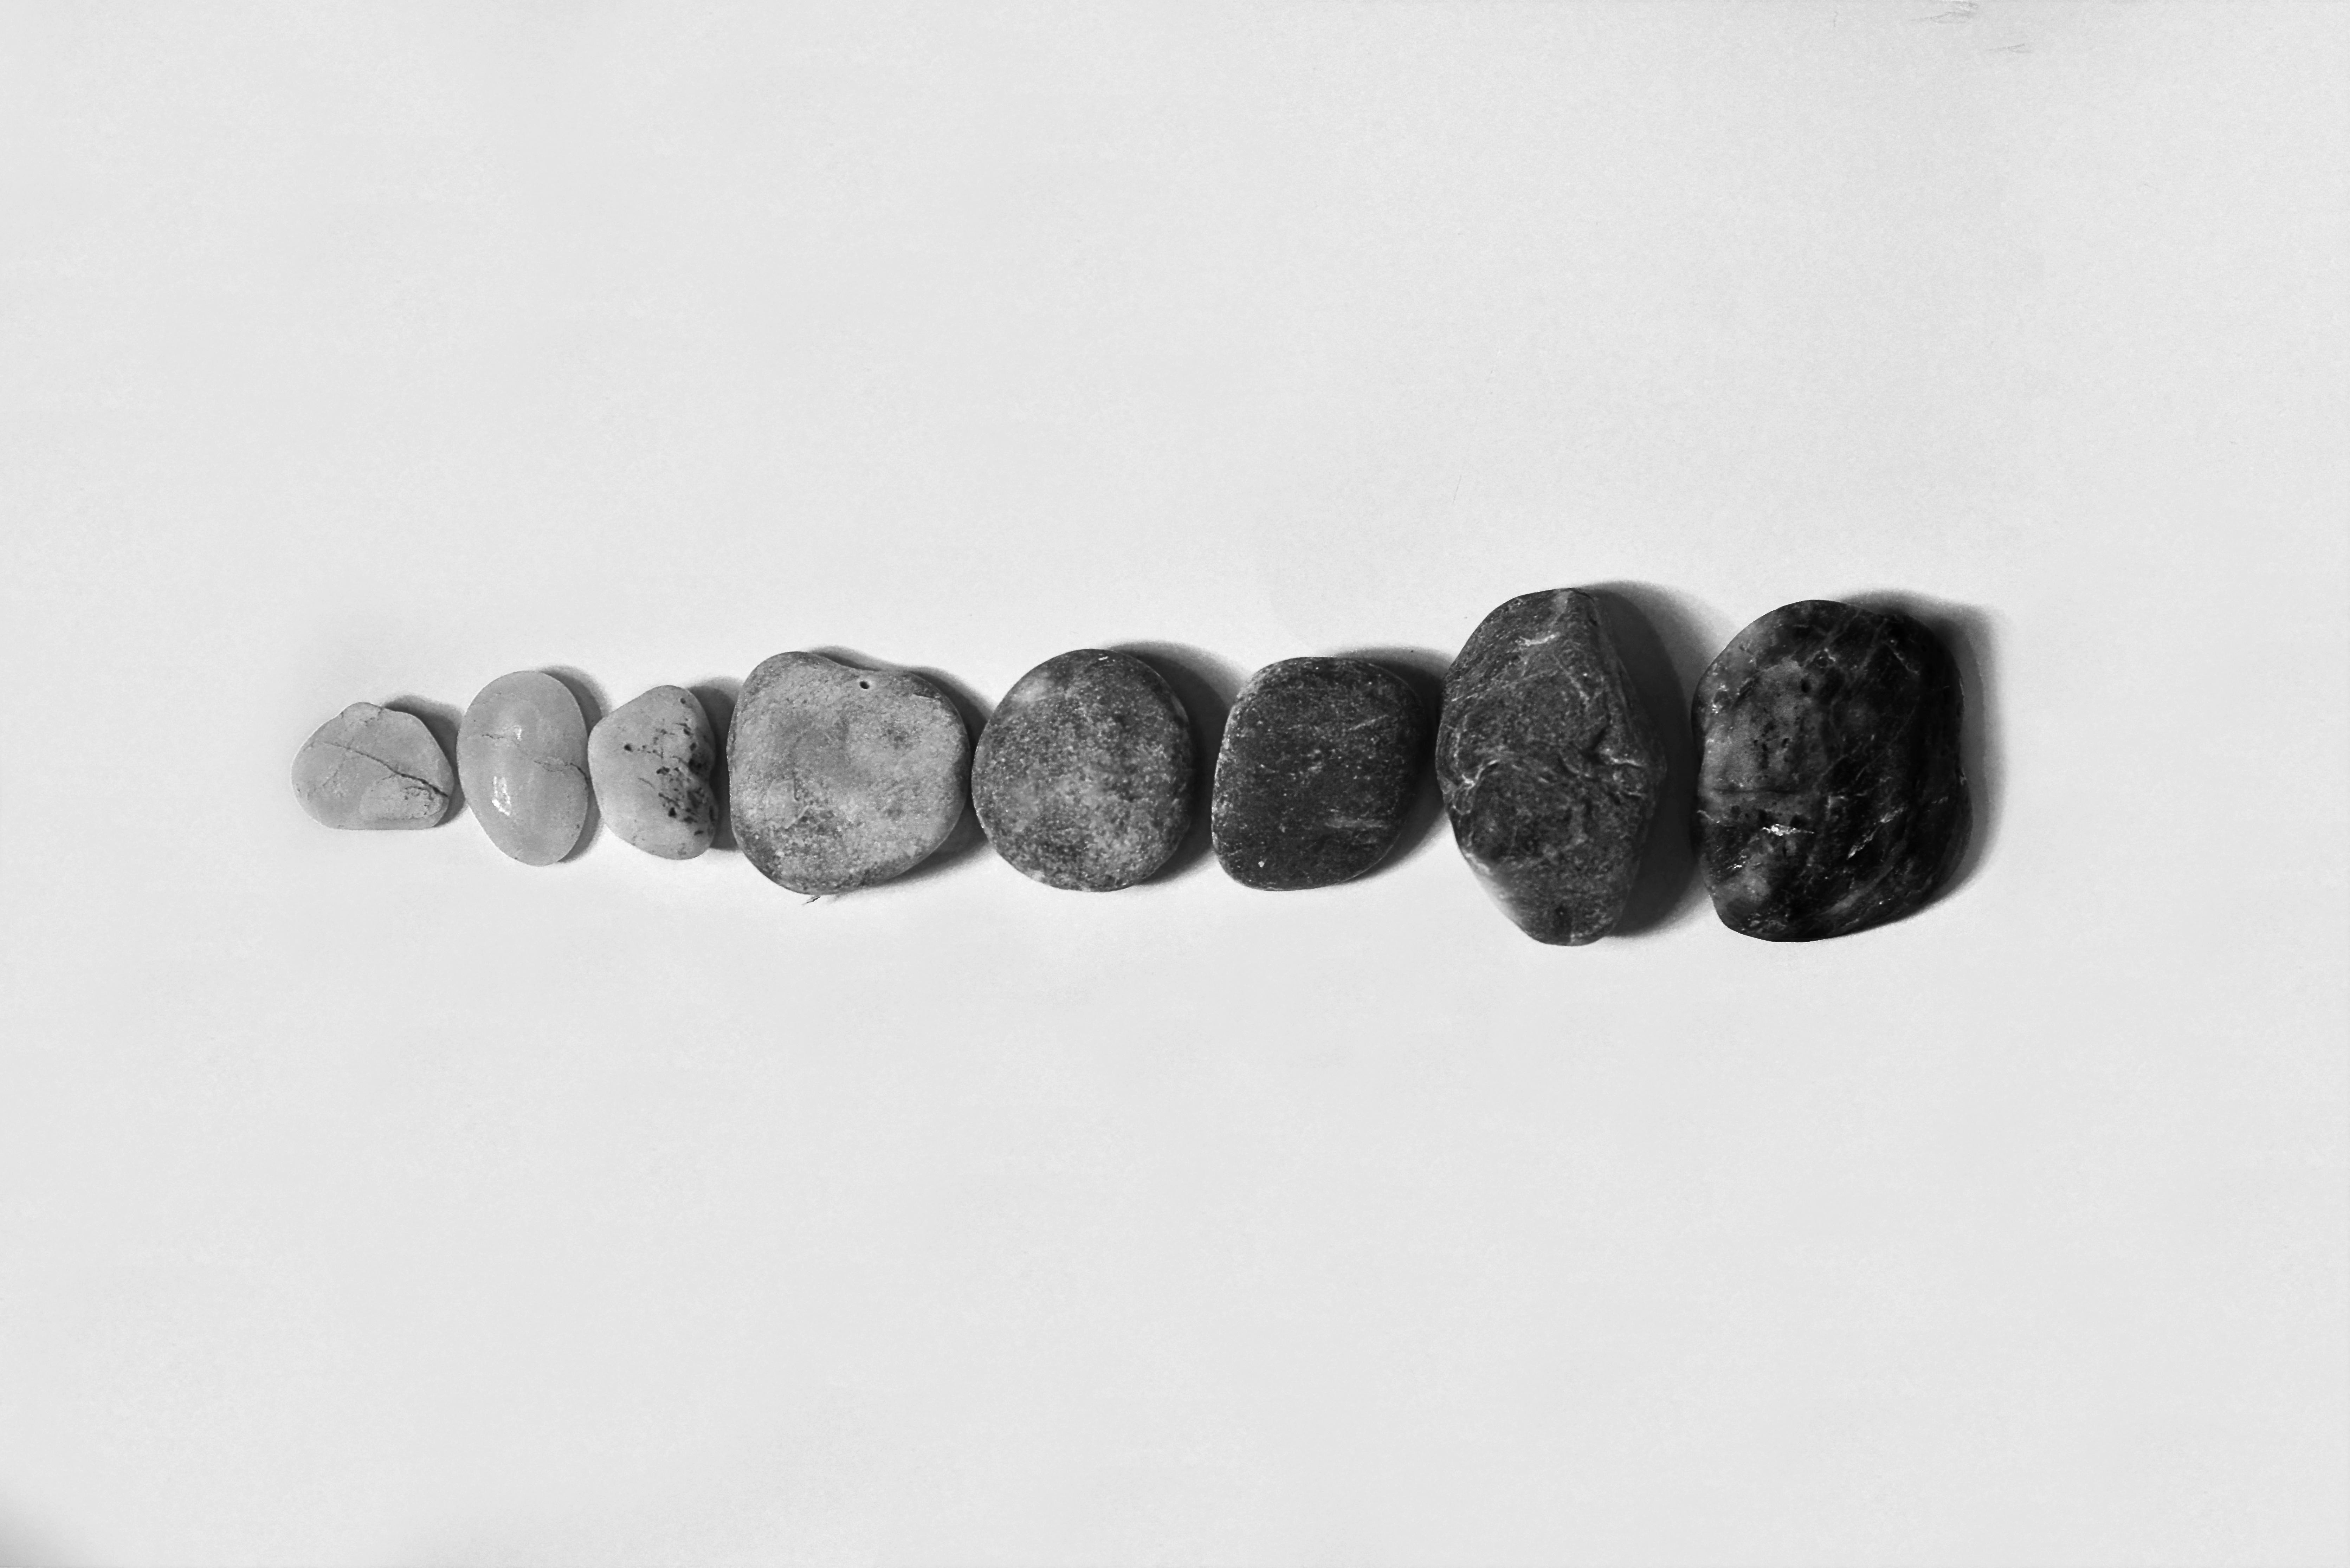 Row of Black and Gray Polished Pebble on Gray Surface